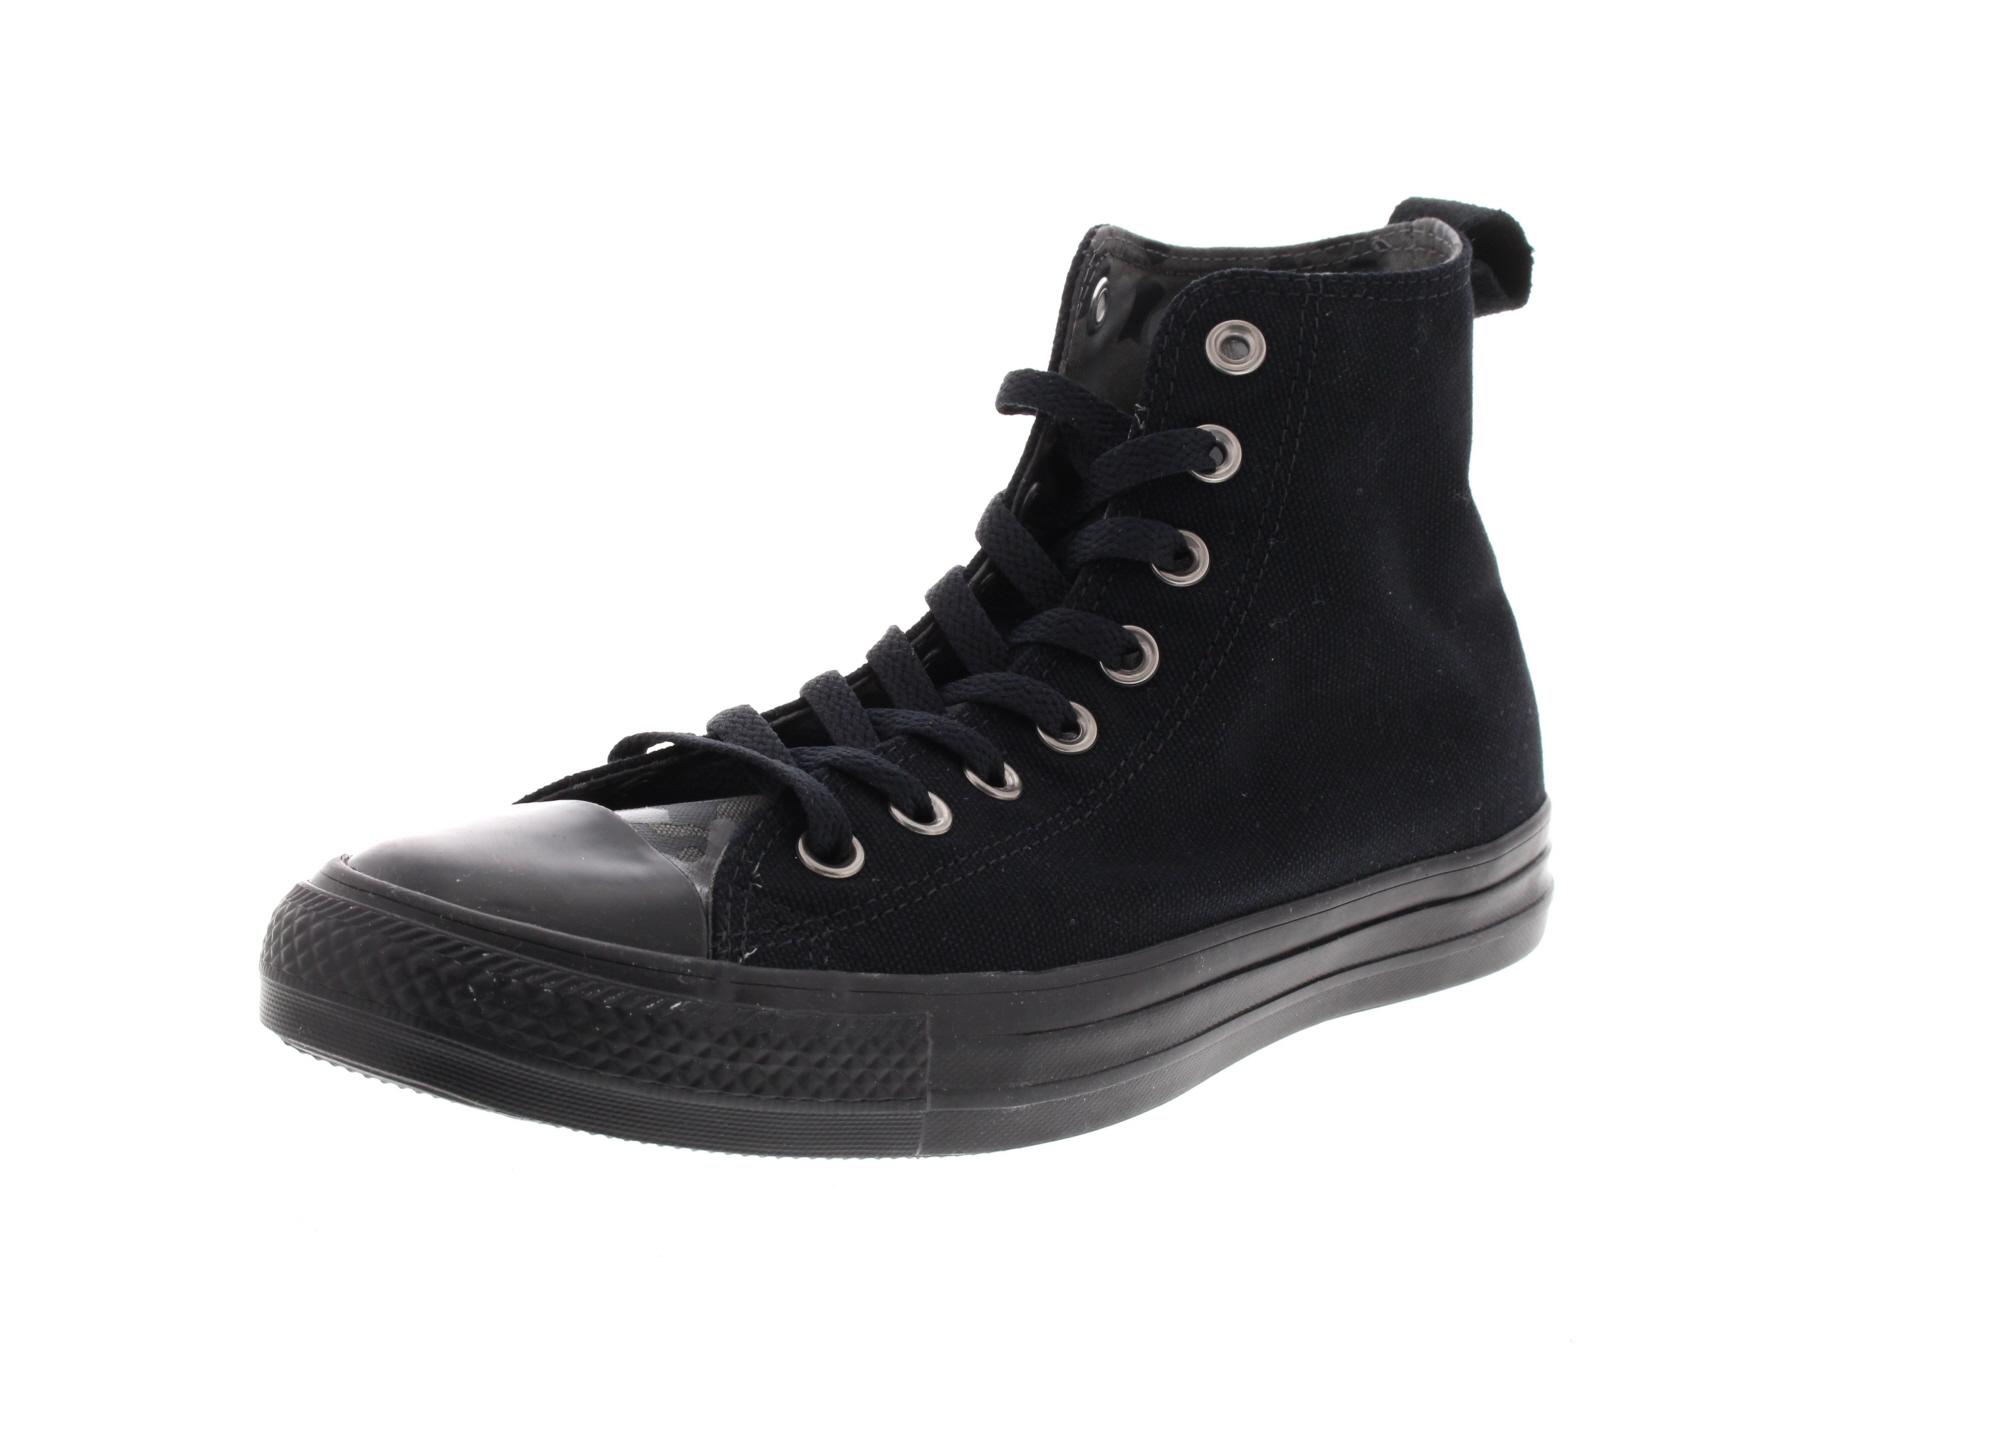 CONVERSE Schuhe - Sneakers CTAS HI 159753C black mason_0